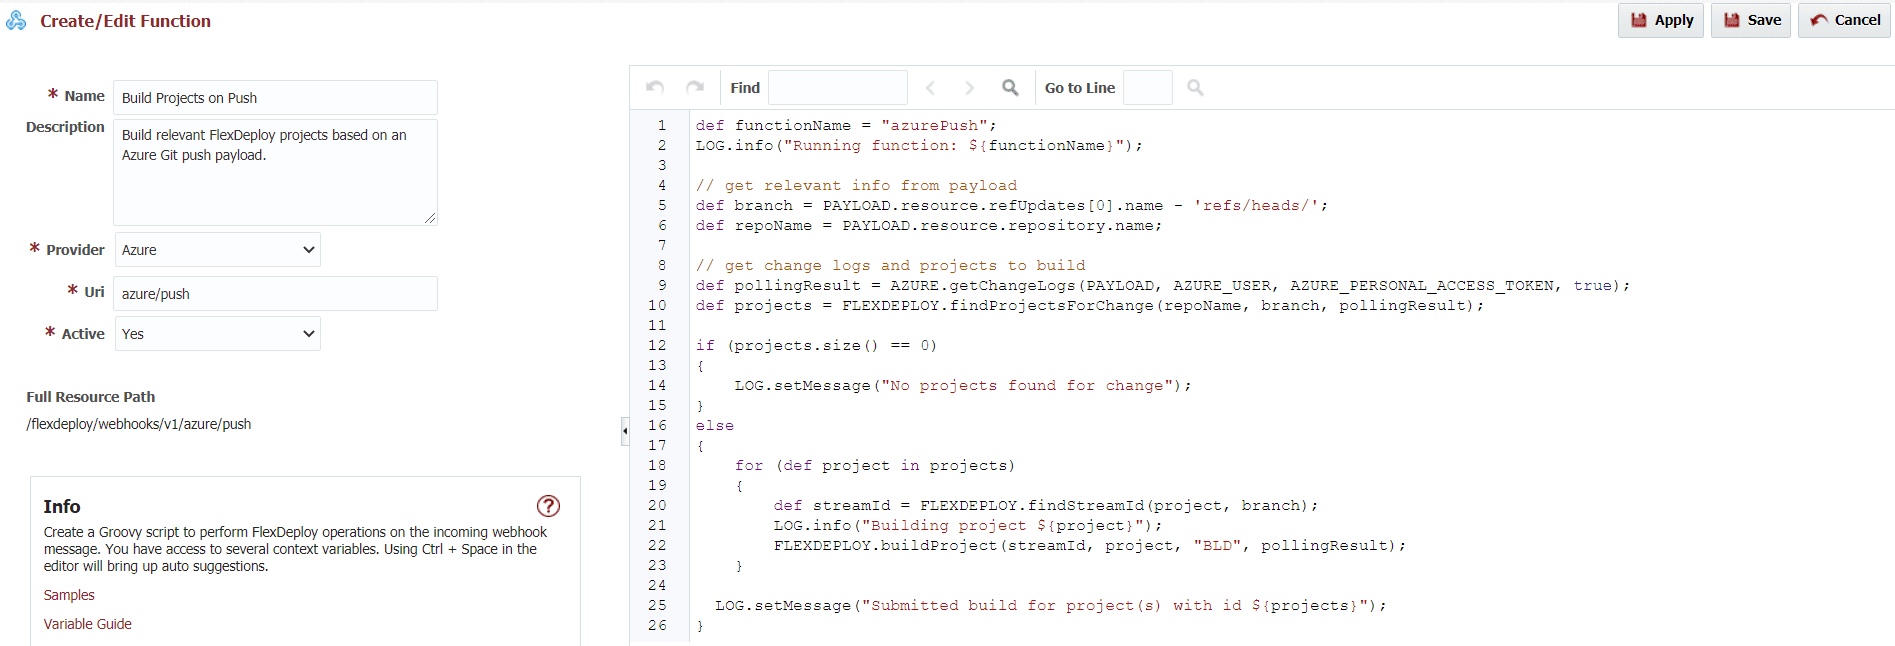 Webhook function options for Azure provider